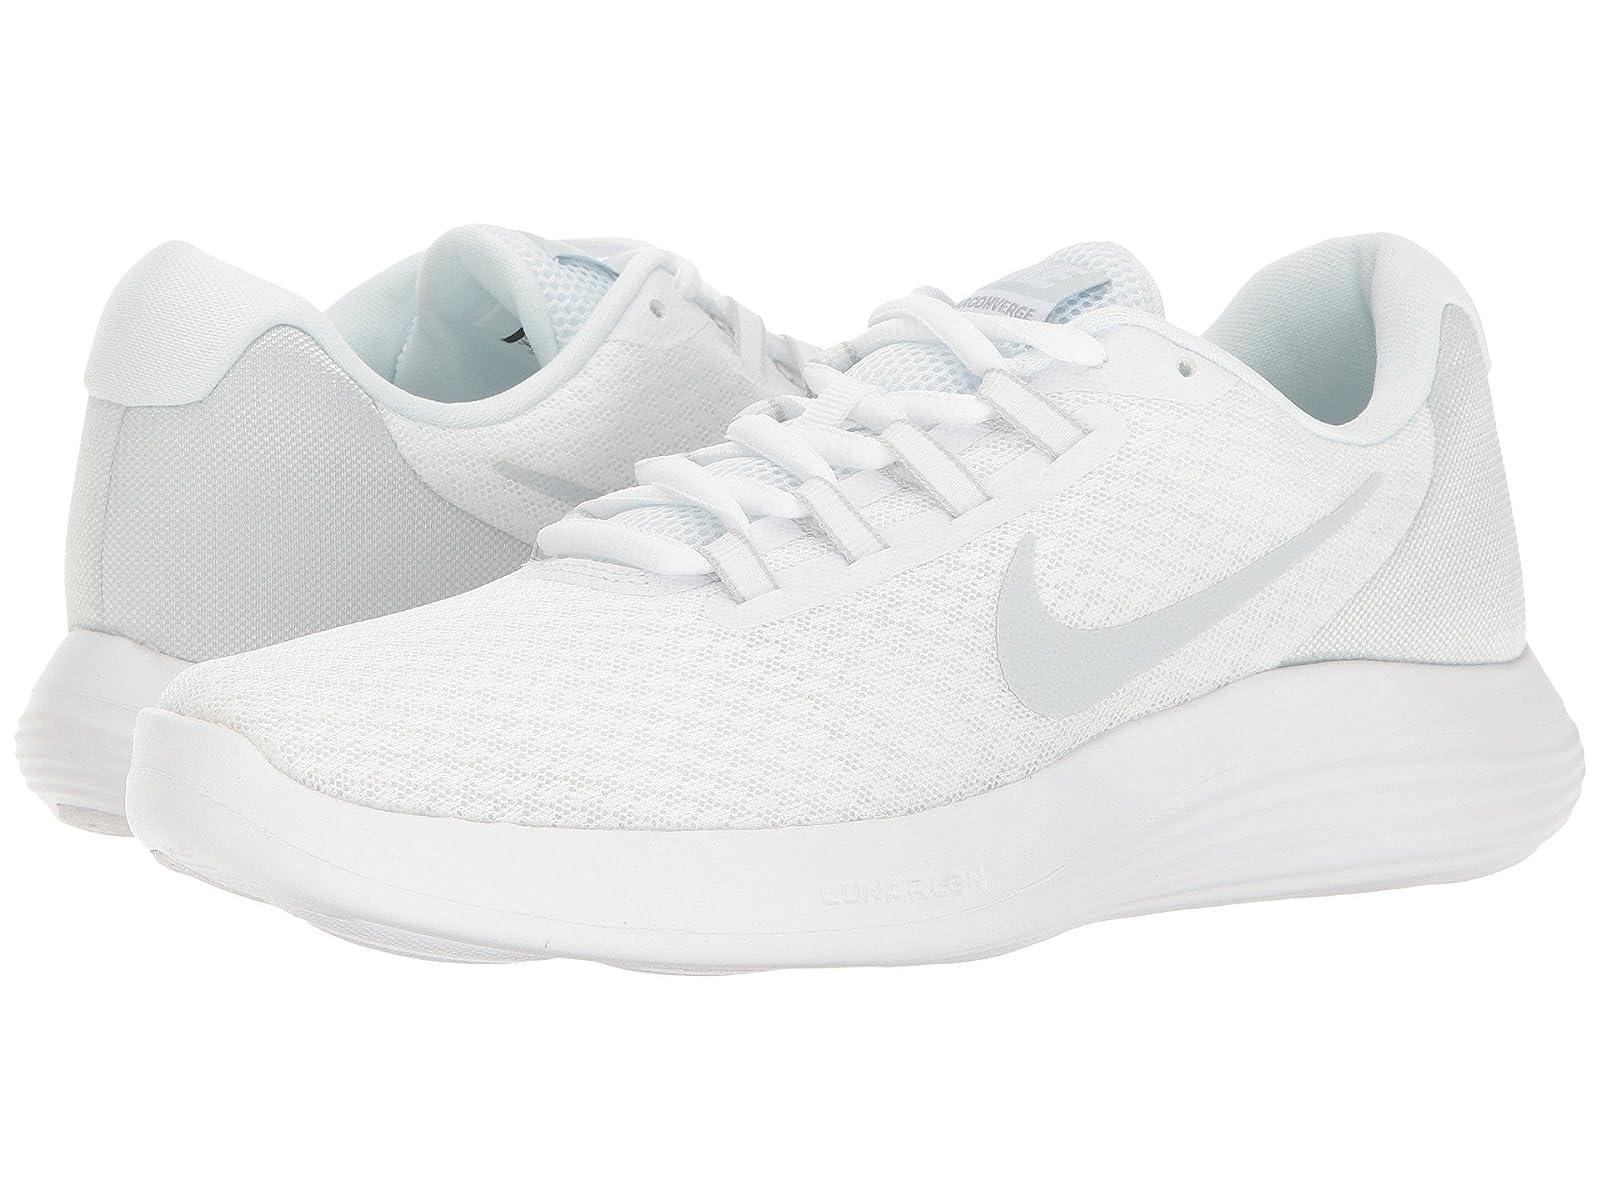 Nike Lunar ConvergeCheap and distinctive eye-catching shoes